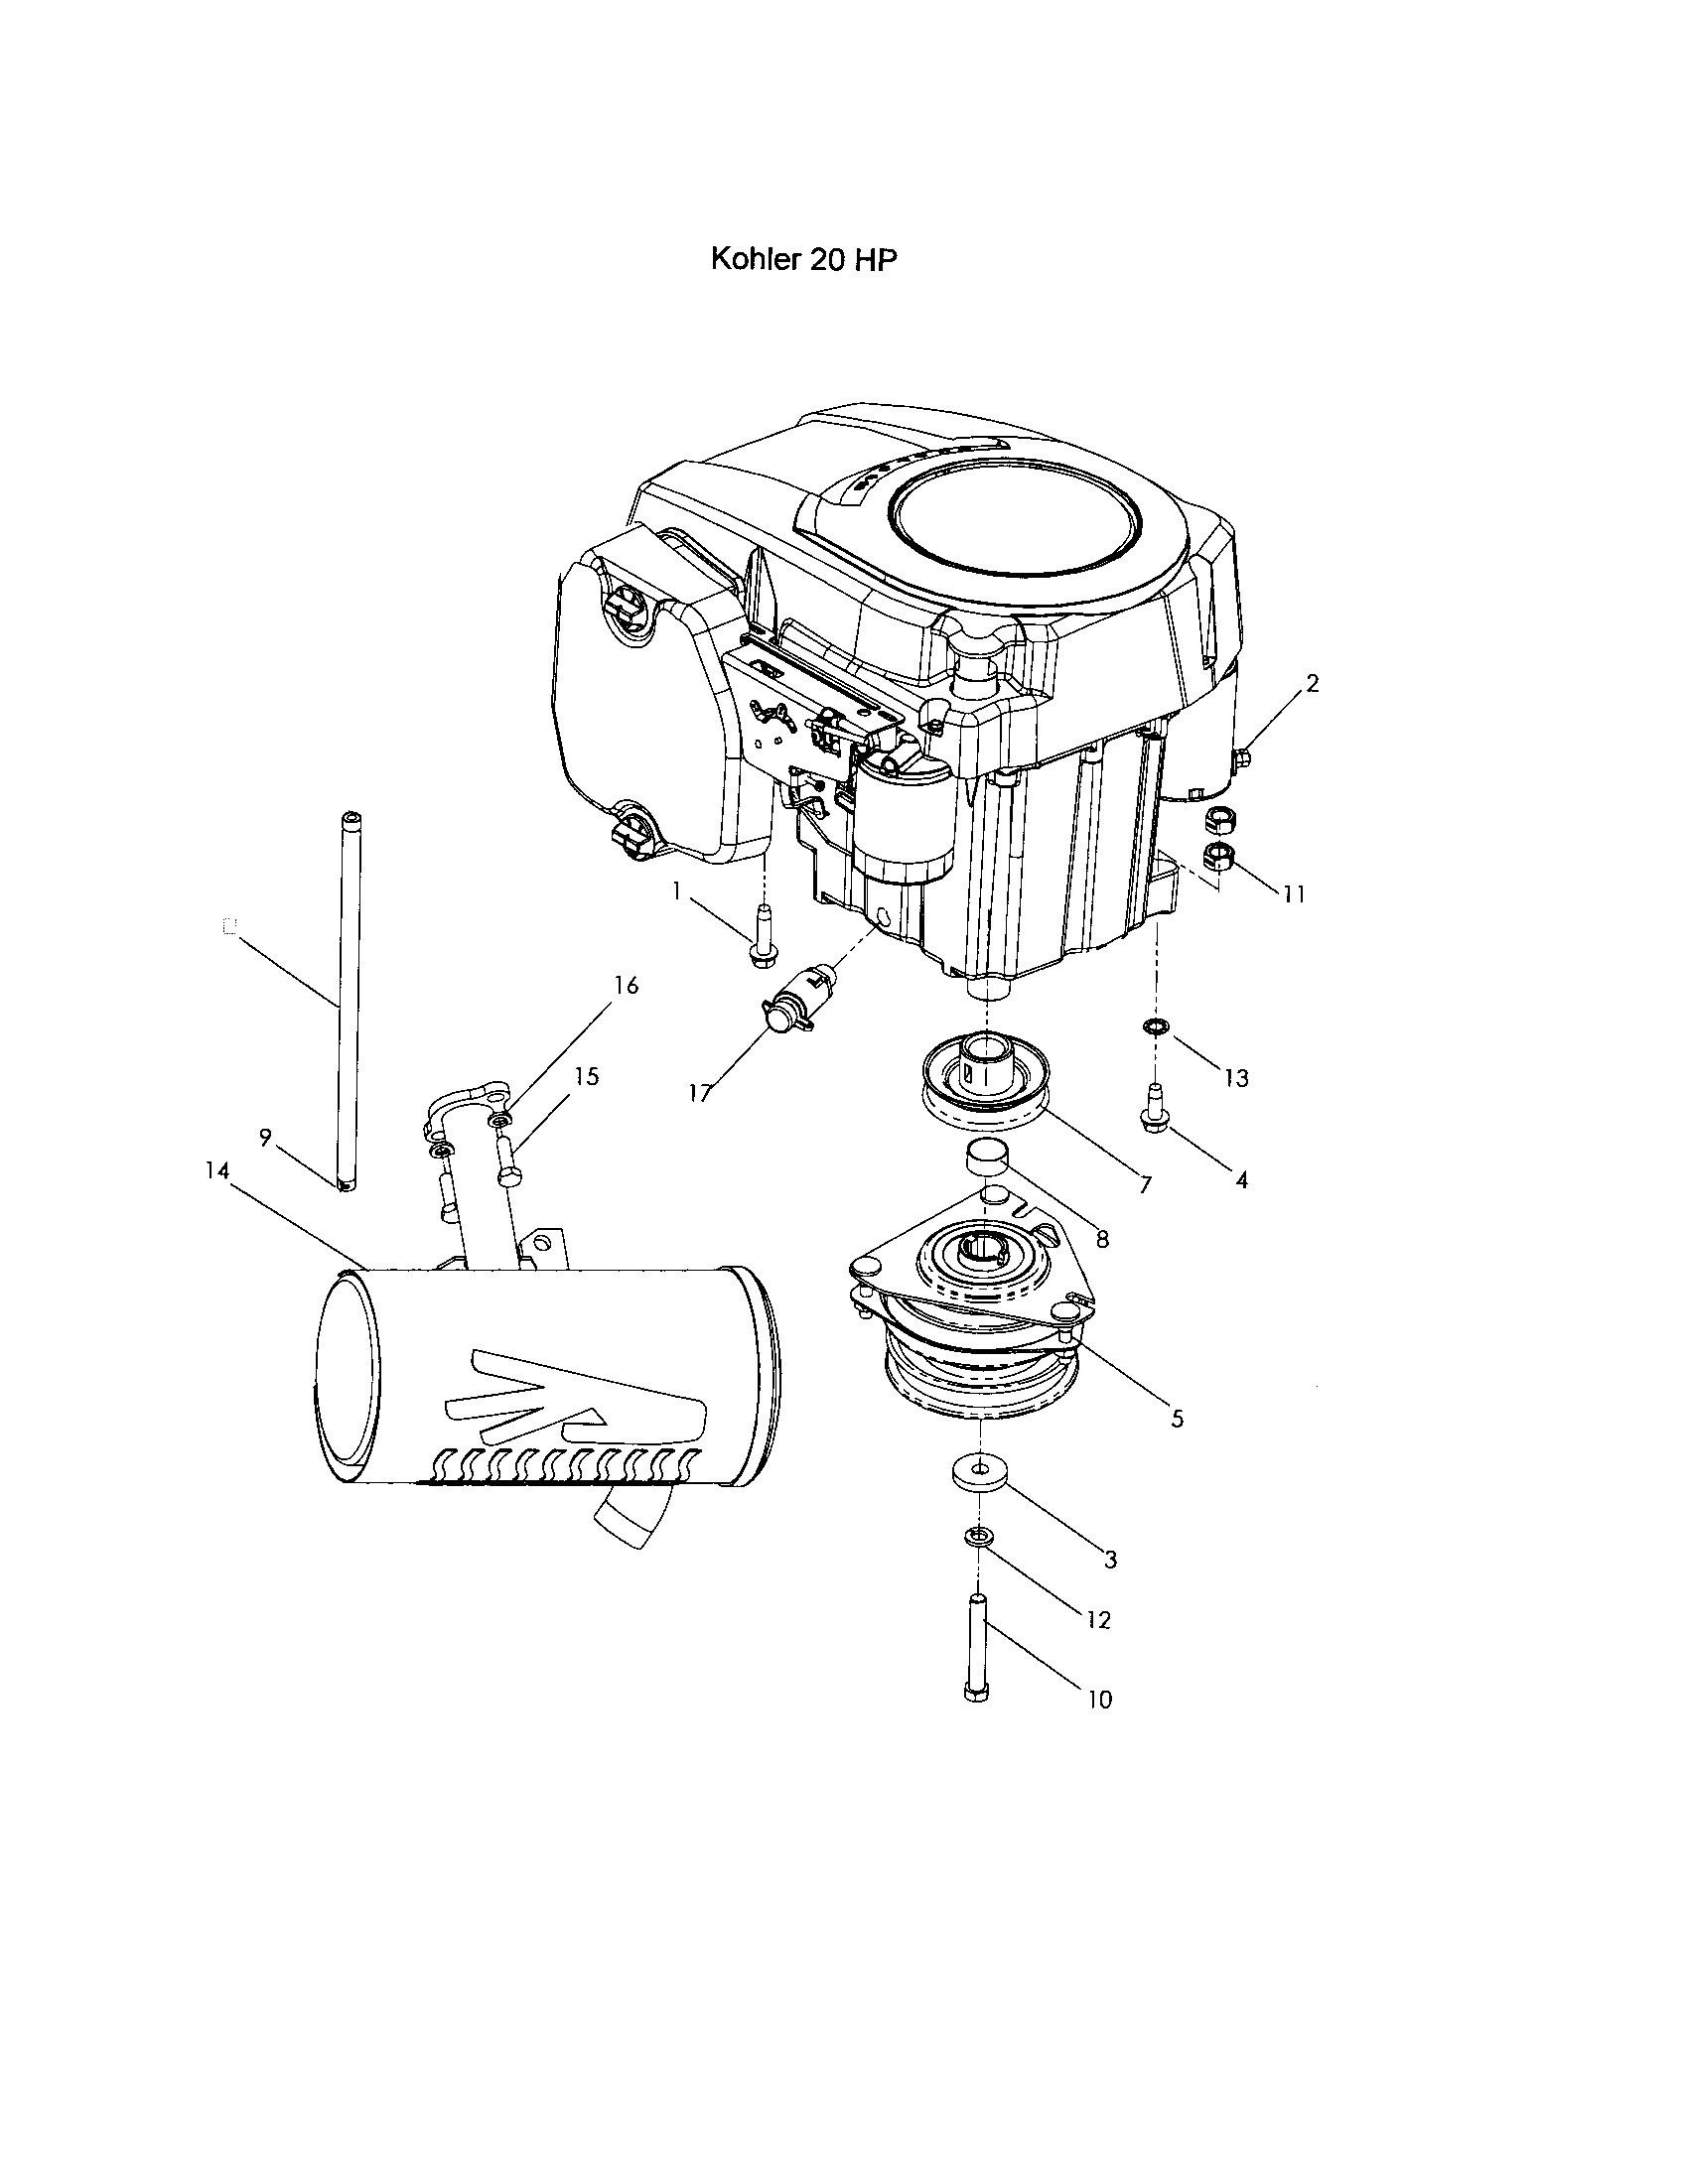 25 Hp Kohler Command Engine Wiring Diagrams